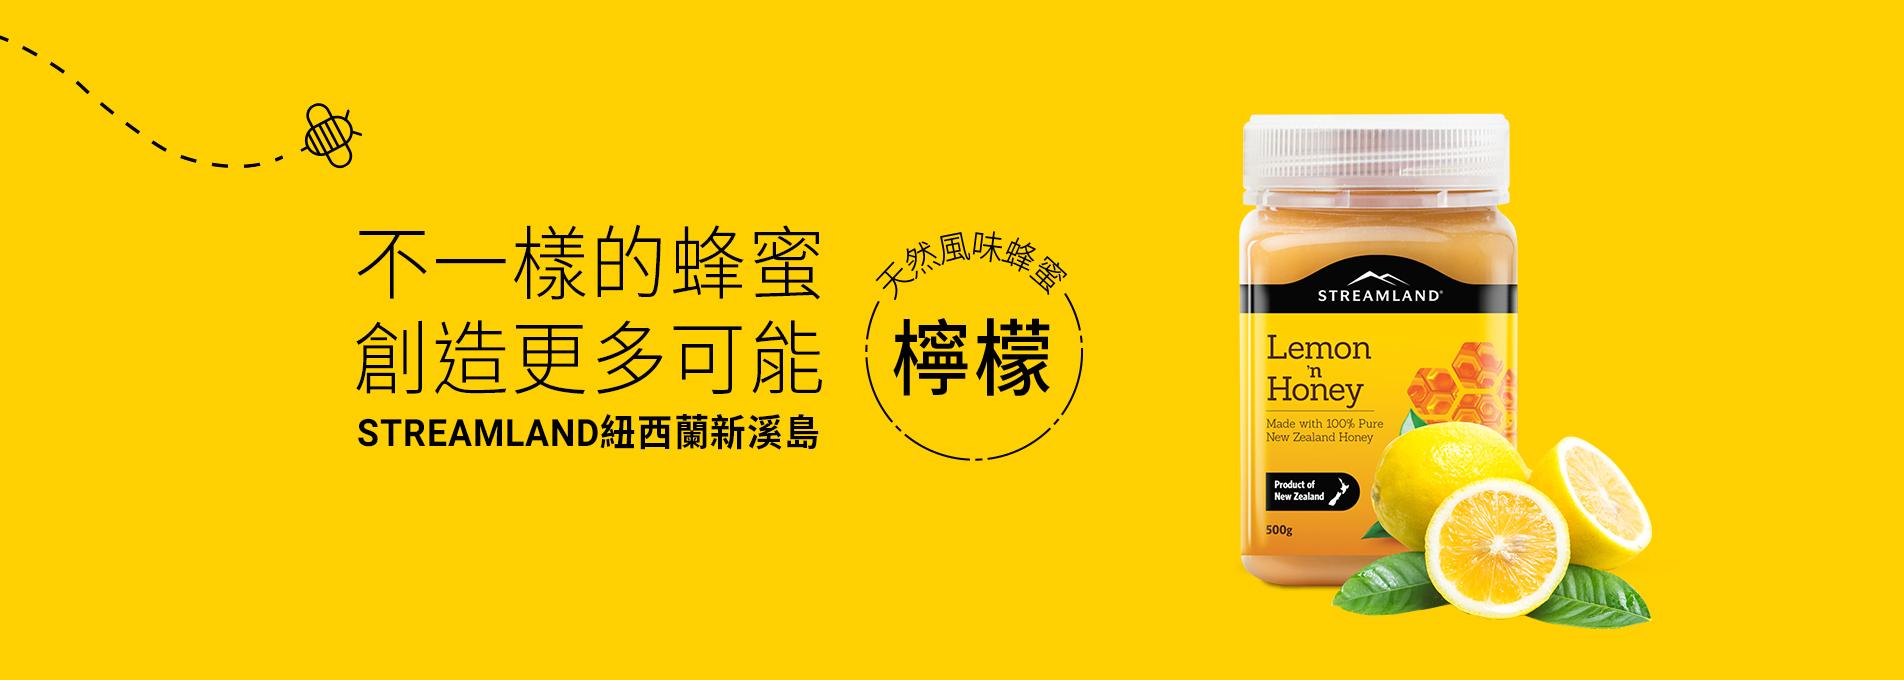 STREAMLAND紐西蘭新溪島 風味蜂蜜-檸檬 500g